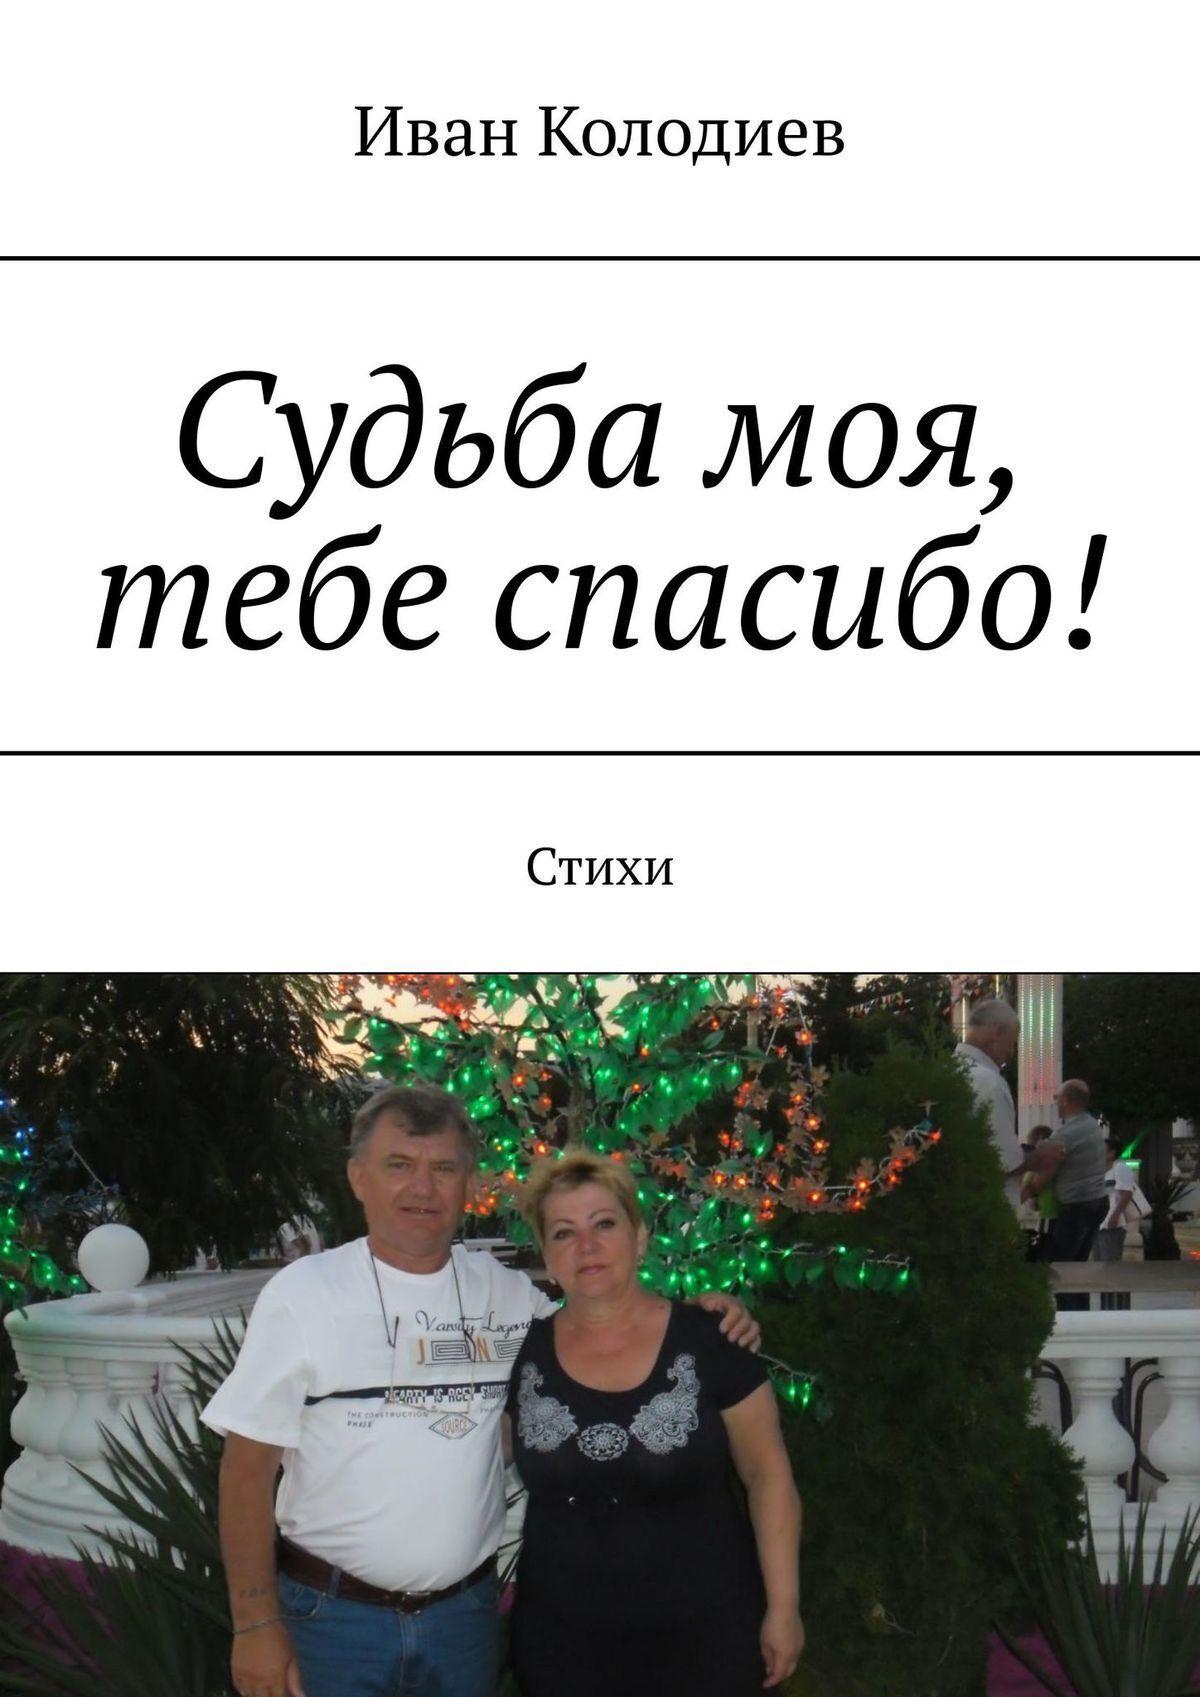 Иван Колодиев Судьба моя, тебе спасибо! Стихи иван колодиев судьба моя тебе спасибо стихи